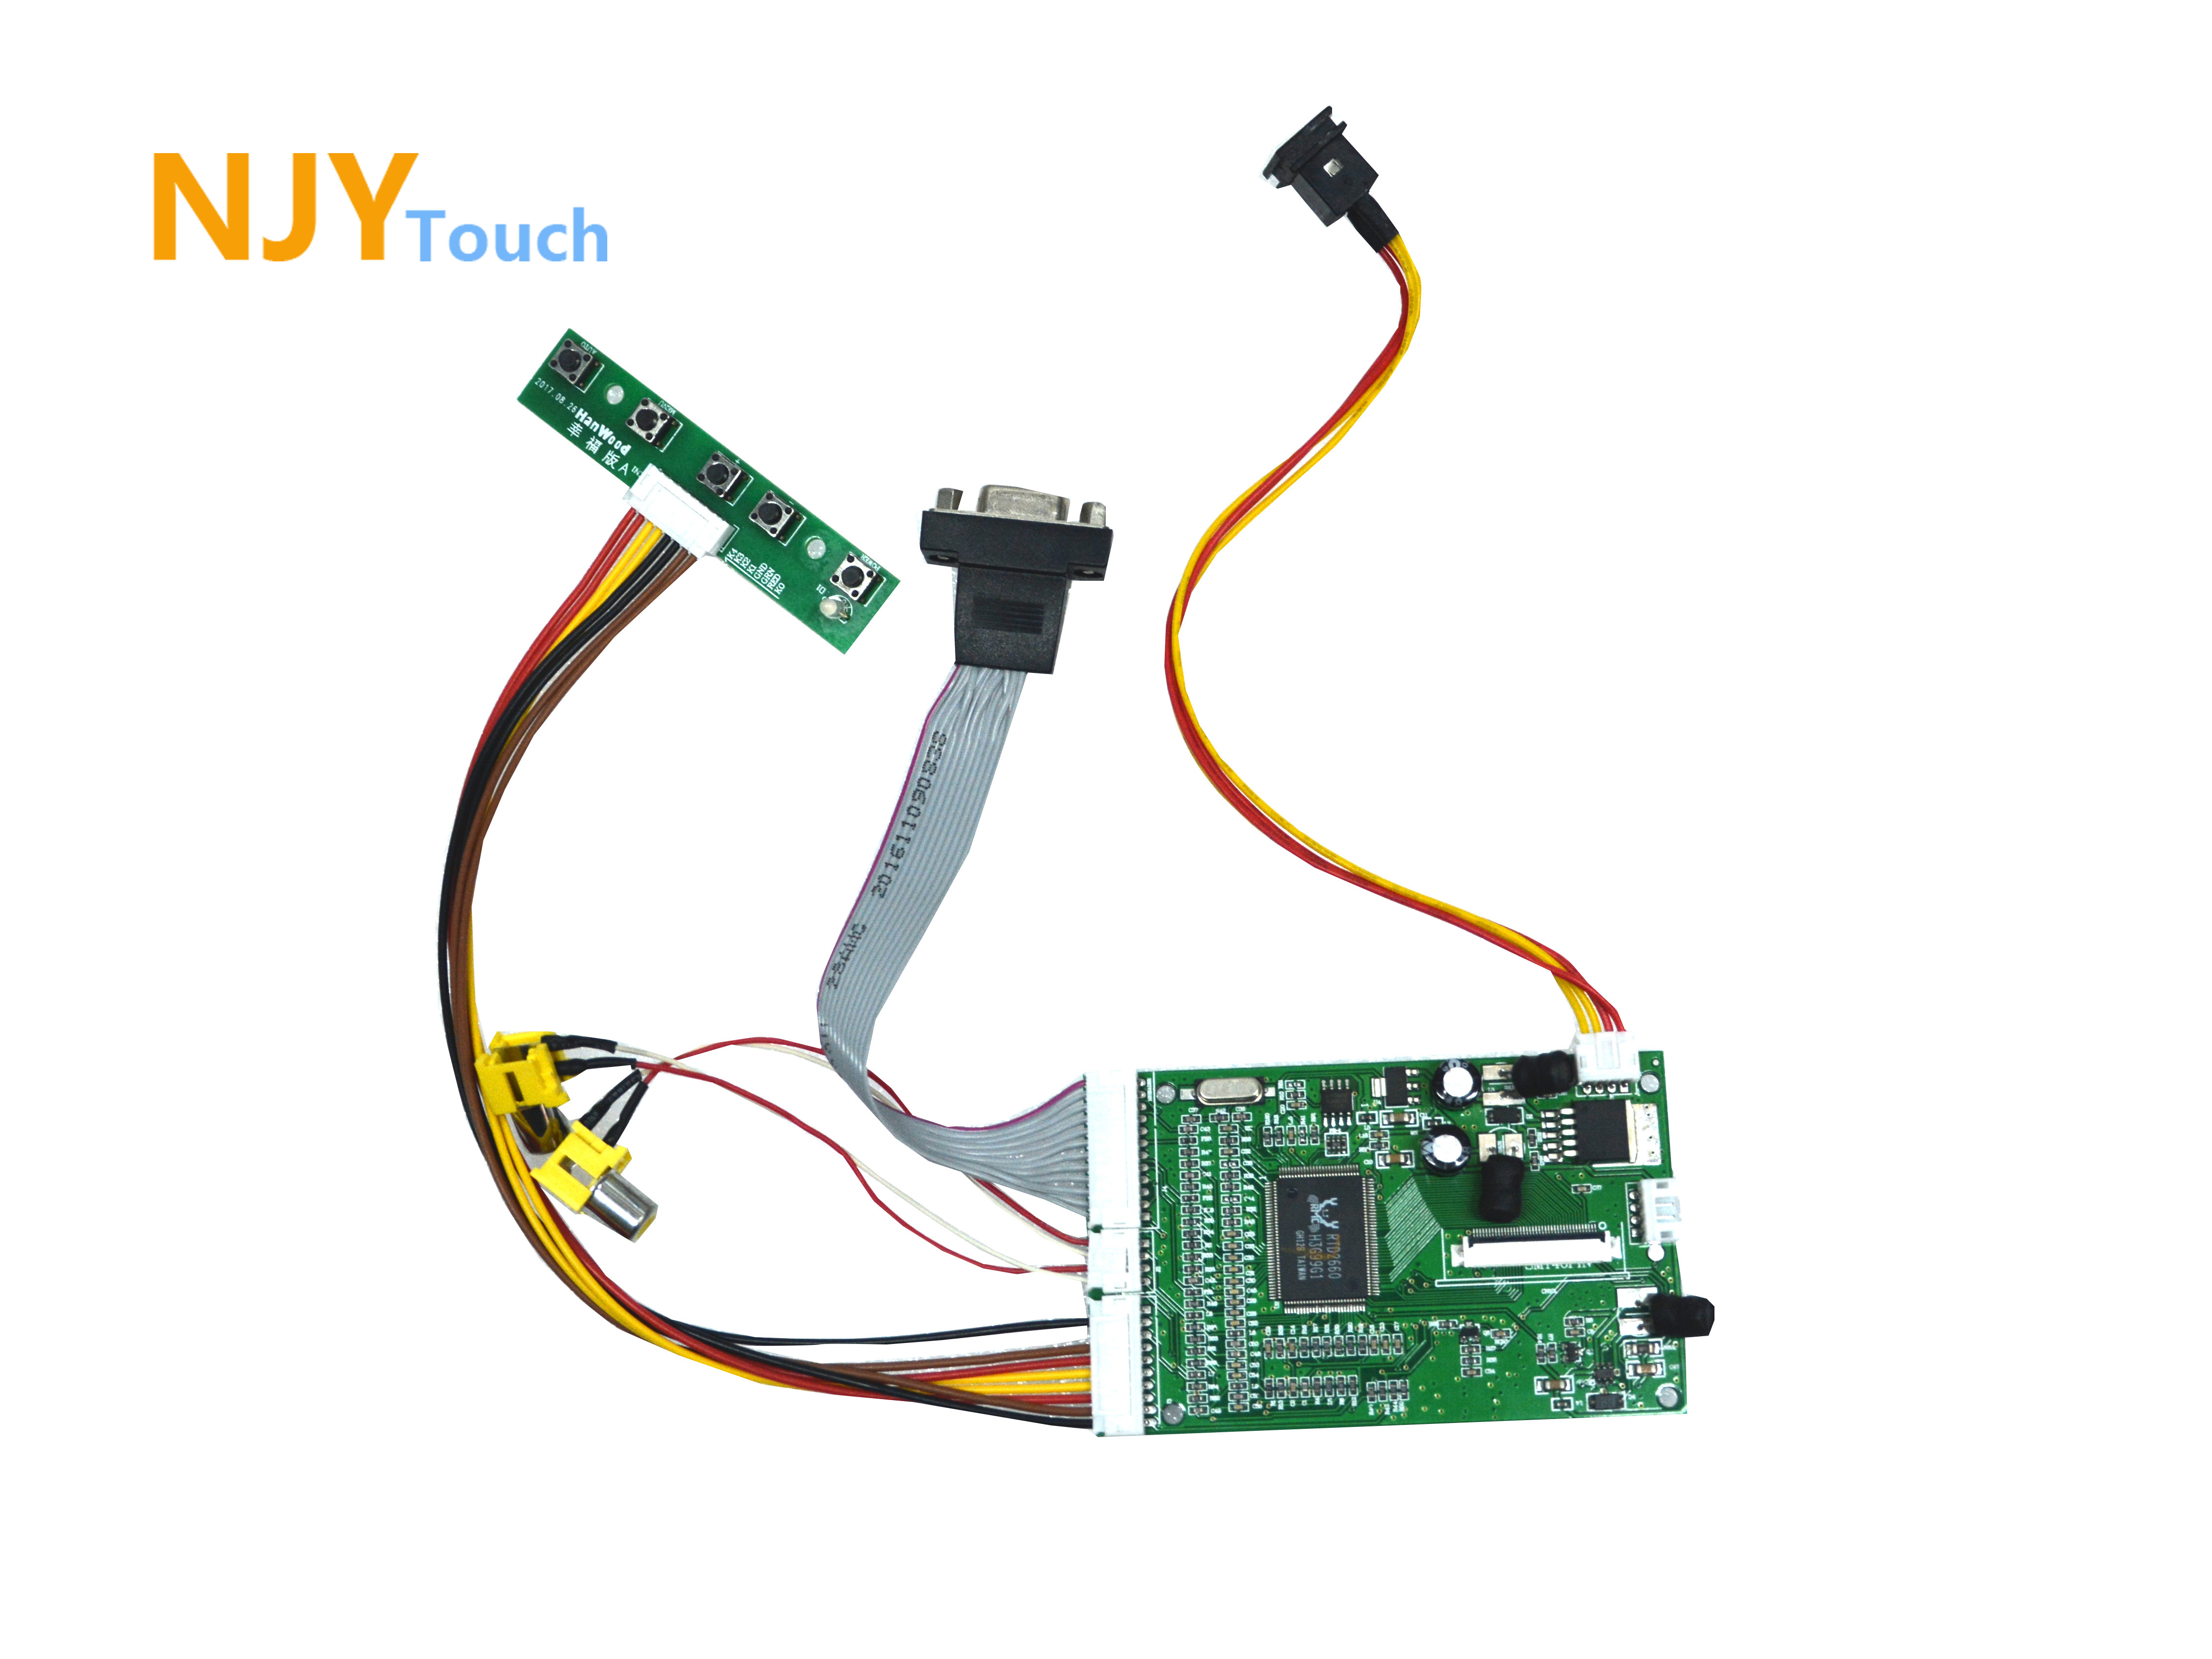 NJYTouch 2AV VGA LCD Controller Board Kit For 4.3inch HSD043I9W1-A00 480x272 LCD Screen